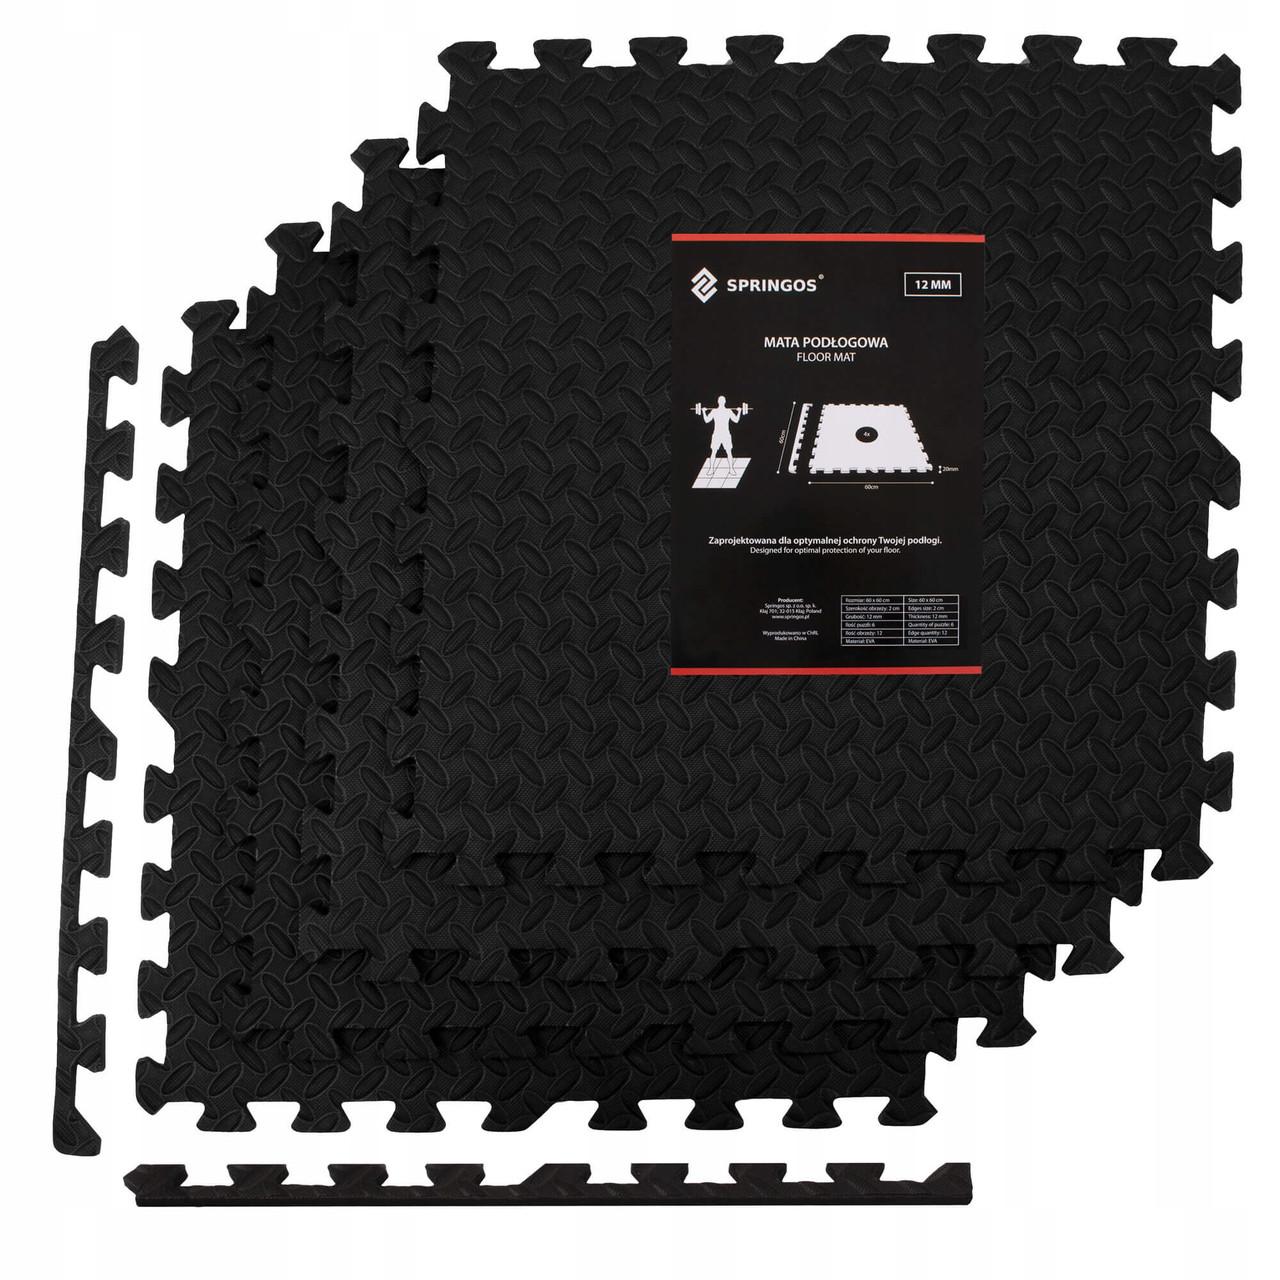 Мат-пазл (ласточкин хвост) Springos Mat Puzzle EVA 120 x 120 x 1.2 cм FM0004 Black. Мат-татами